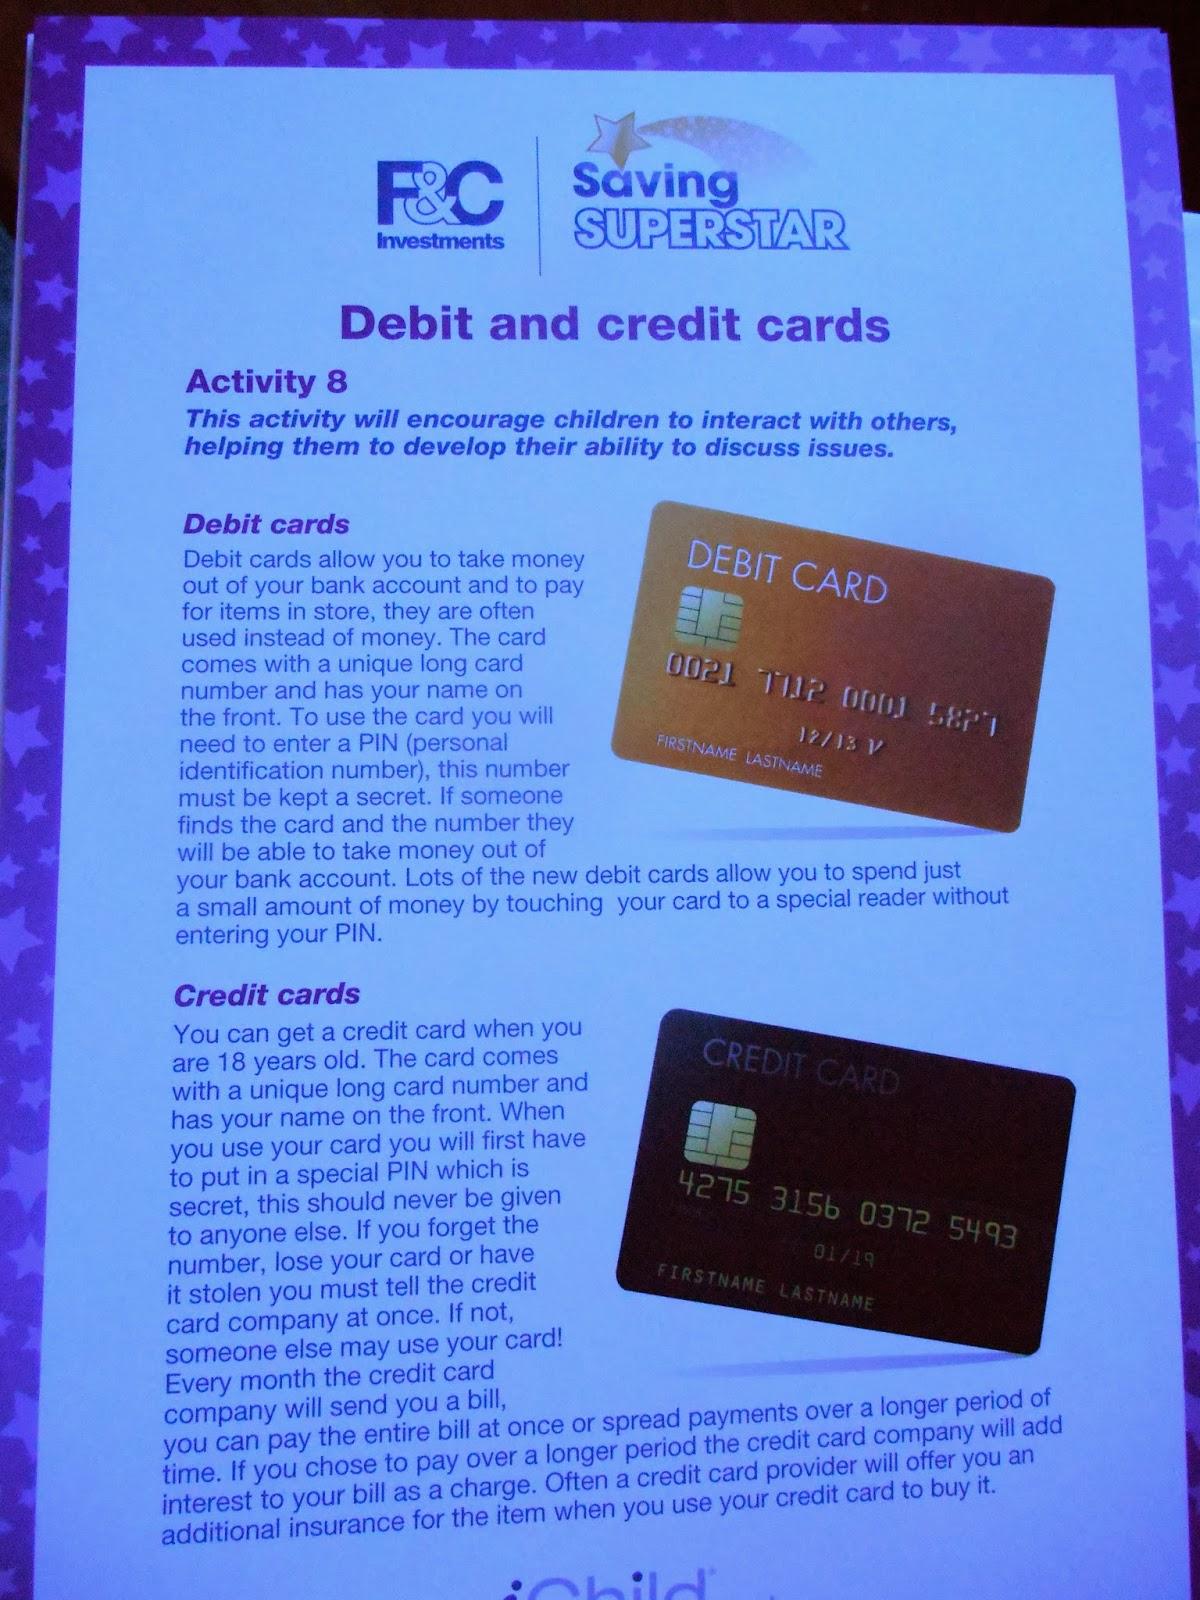 Simple Savings. Arizona Copper Rx Card. UNA Rx Card. Walgreens Prescription Savings Club. CVS Pharmacy Health Savings Pass. If you need help or need to .